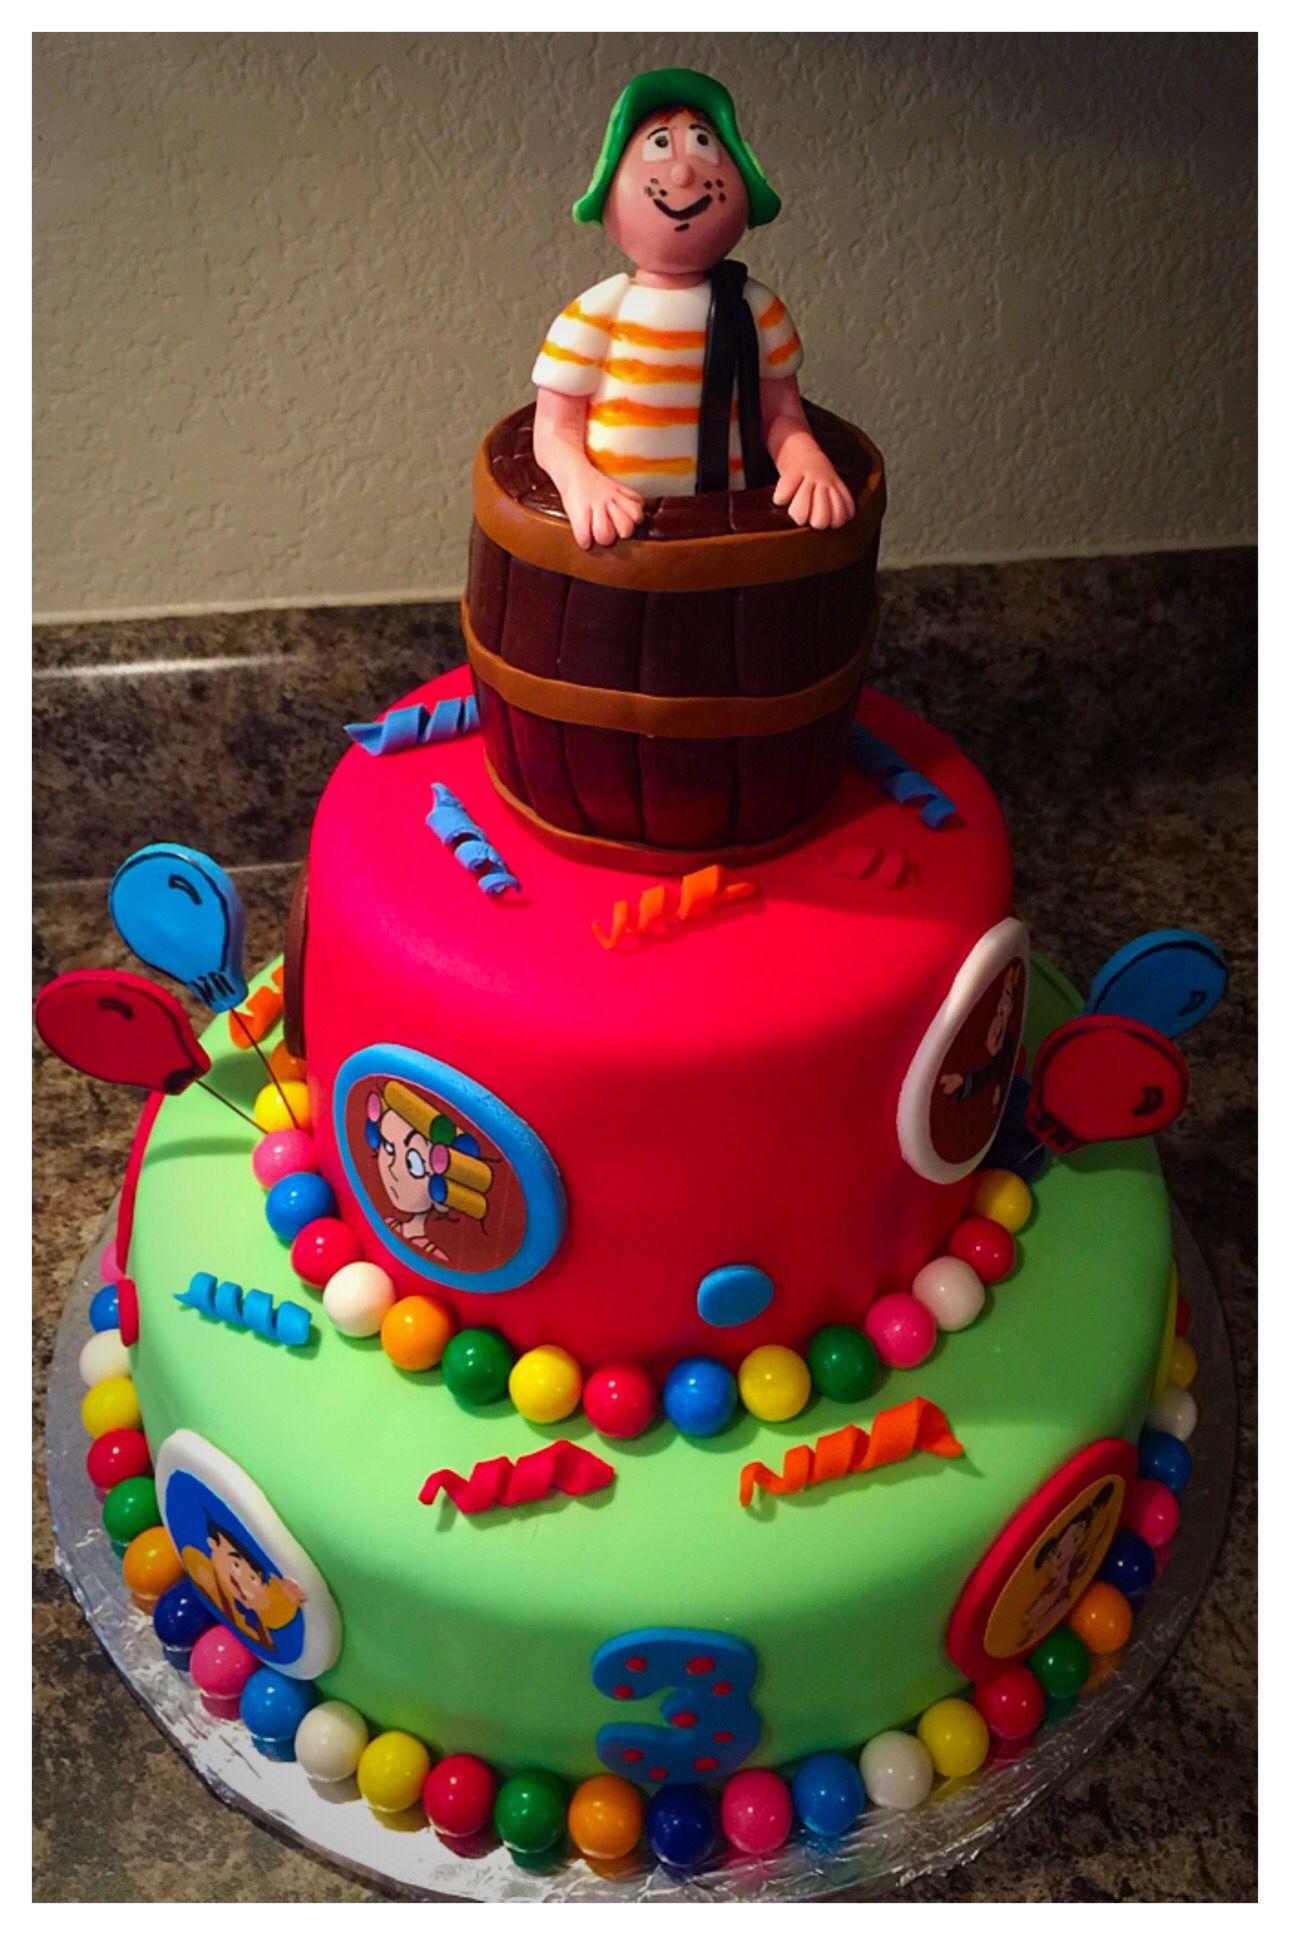 Fondant Cake El Chavo Del 8 Www Celebrationbakery Com Www Facebook Com Gocelebrationbakery